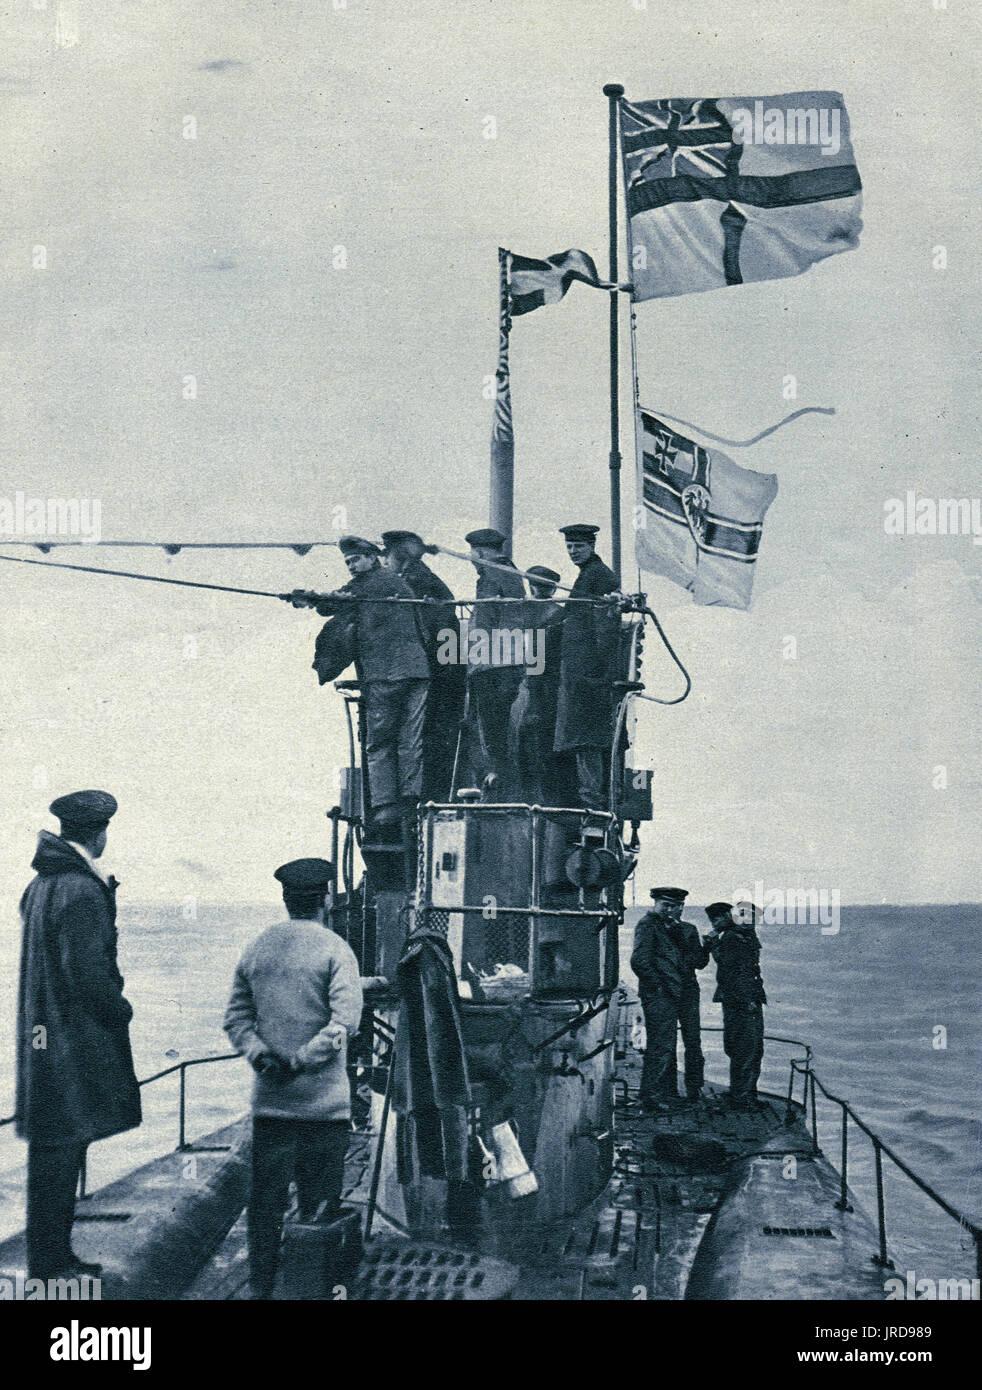 Tolle U Boot Mit Draht Fliegen Ideen - Elektrische Schaltplan-Ideen ...